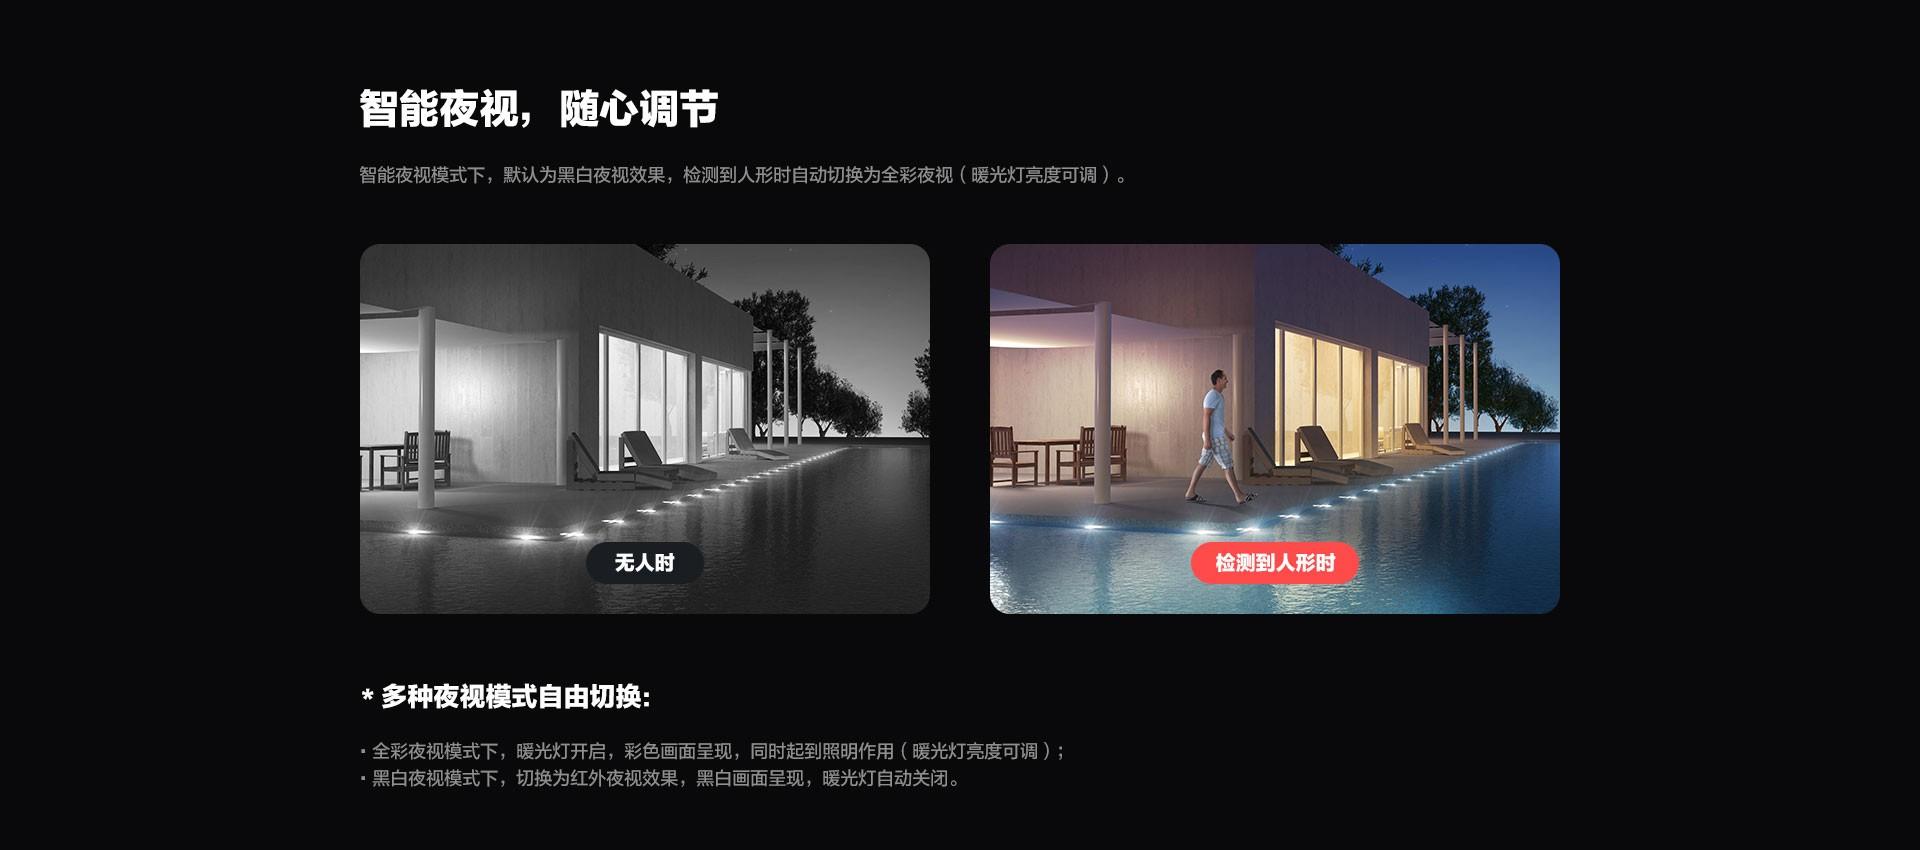 C3HC-web_05.jpg